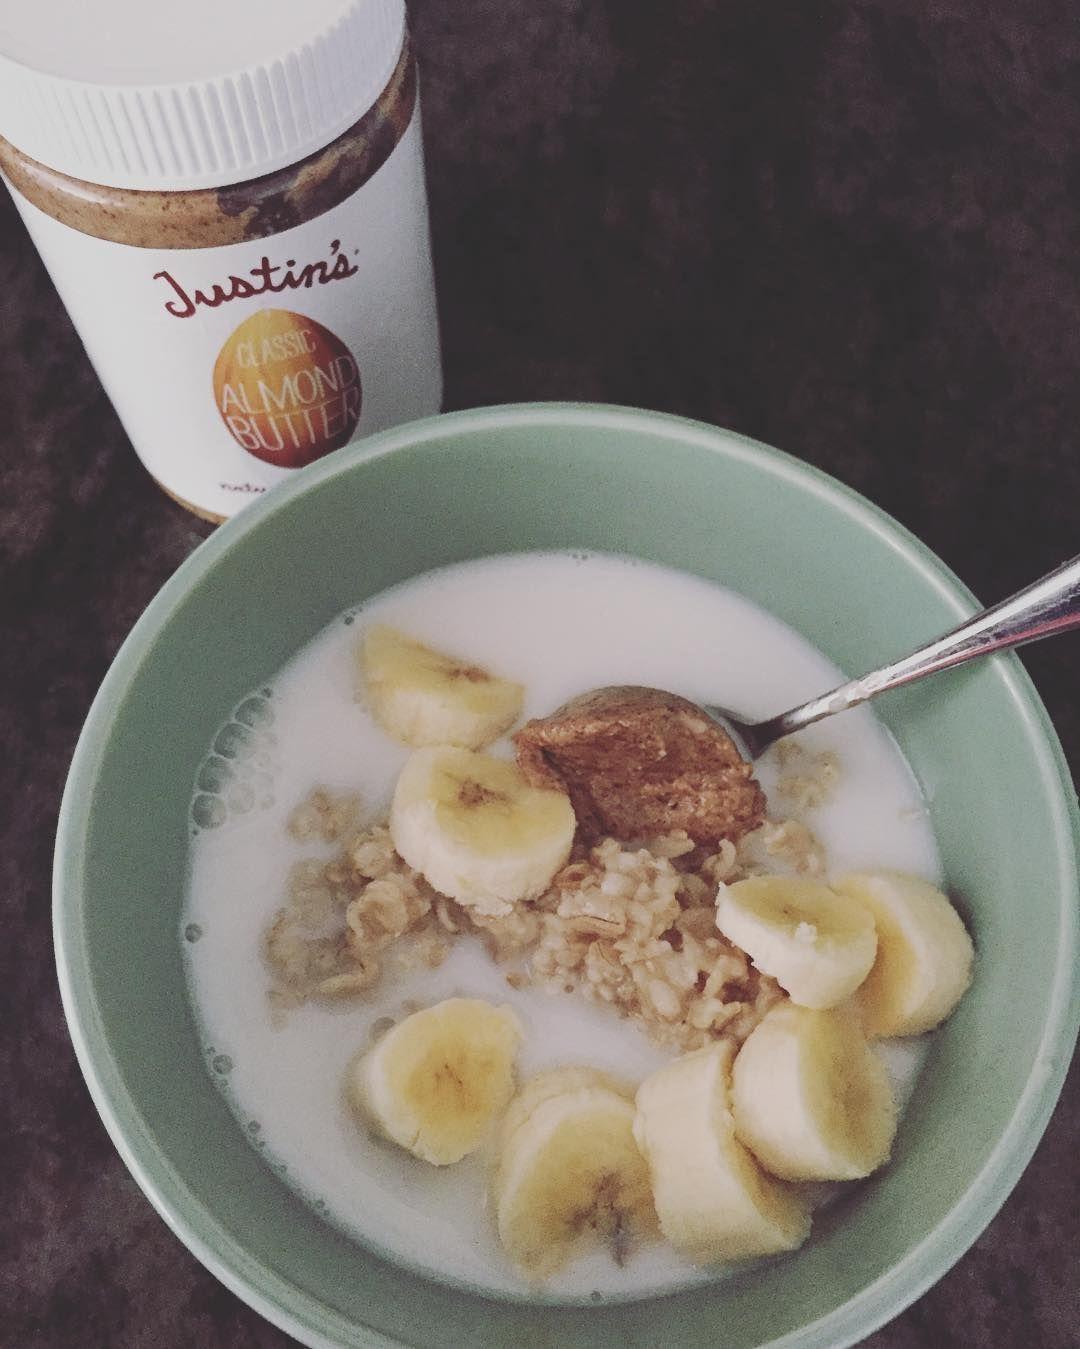 Instagram Photo By Tony Jacobsen May 25 2016 At 4 58pm Utc Food Yummy Breakfast